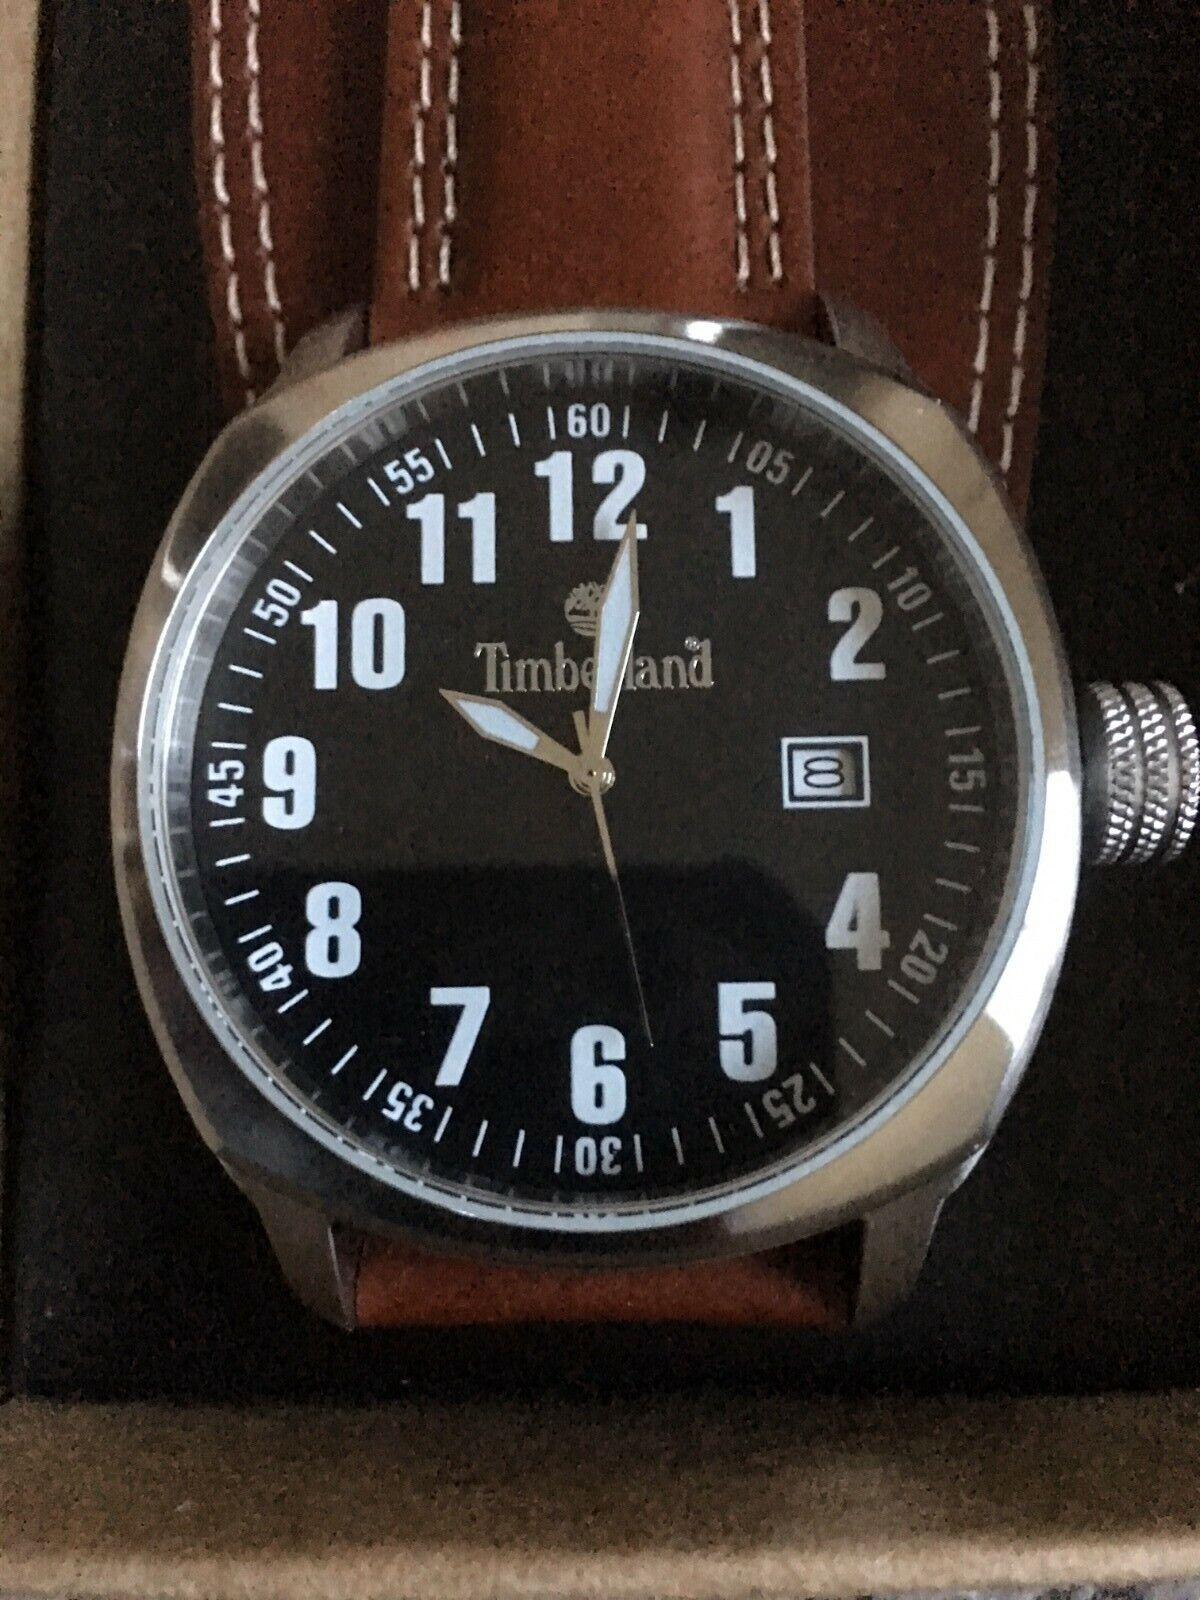 Timberland QT7112103 Watch Brand New - $89.00